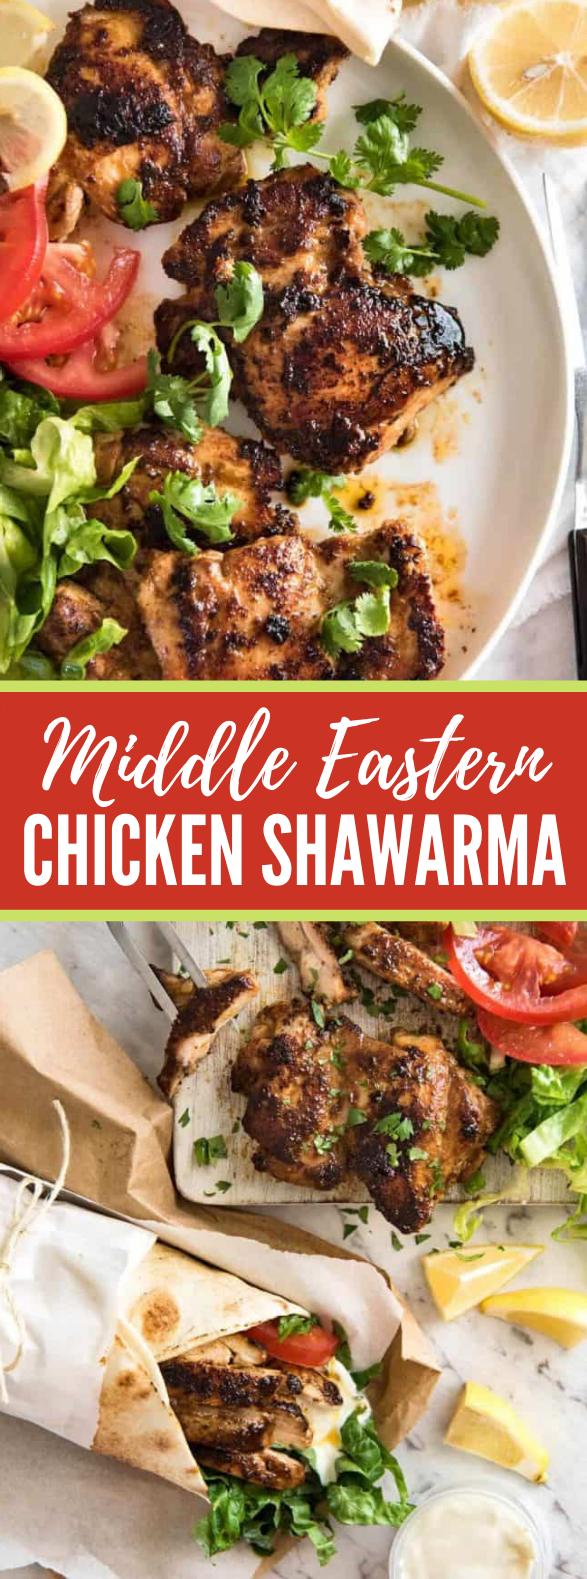 Chicken Shawarma (Middle Eastern) #dinner #comfortfood